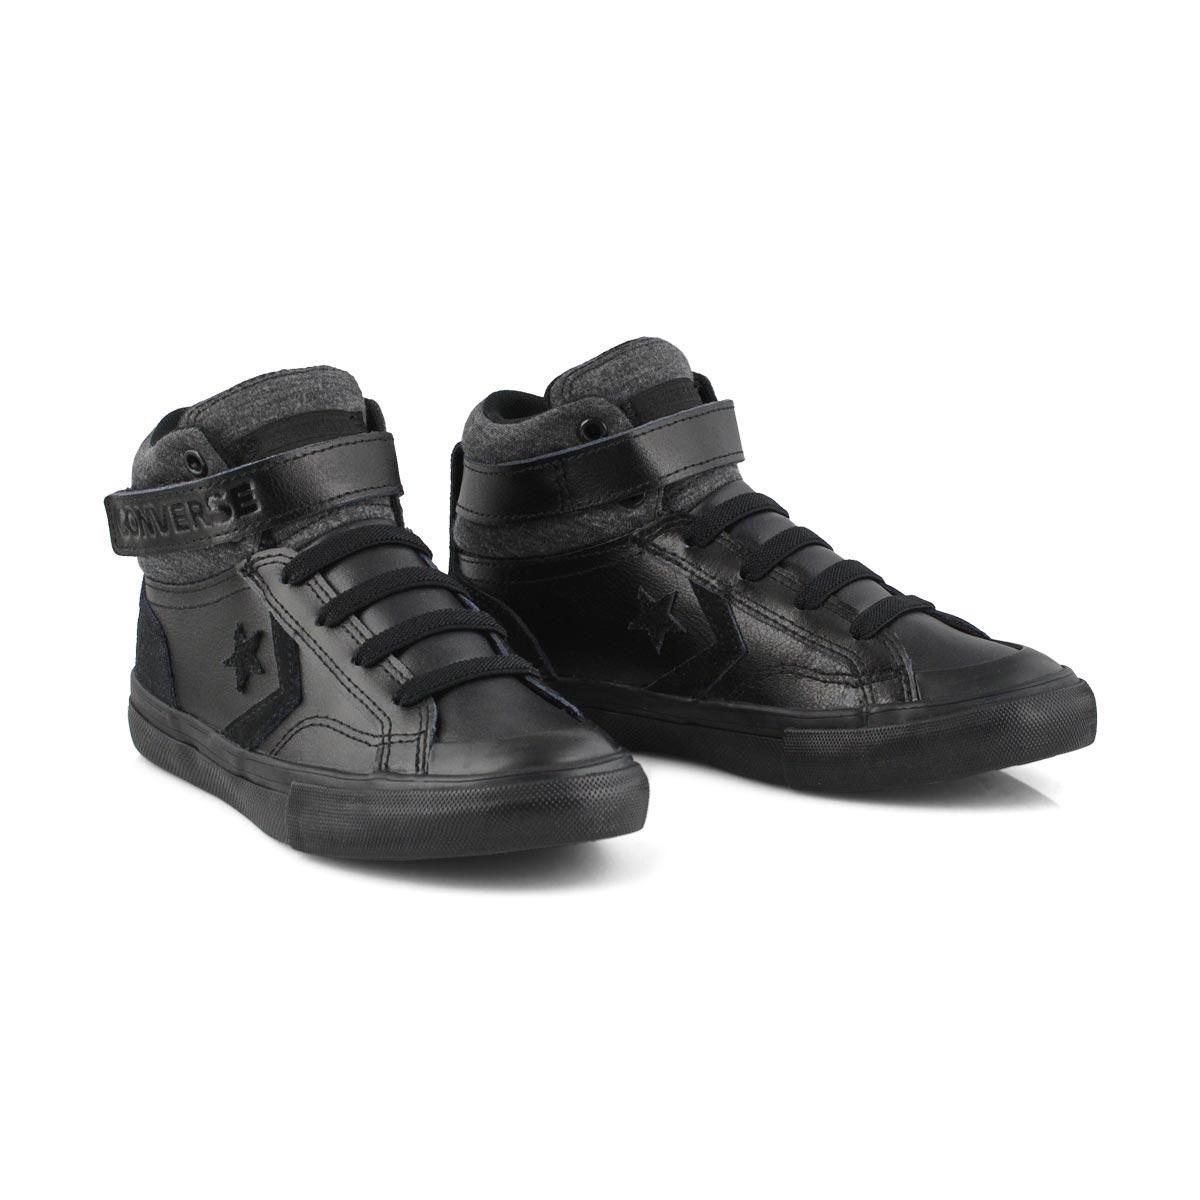 Bys Pro Blaze Strap bk/bk hi top sneaker